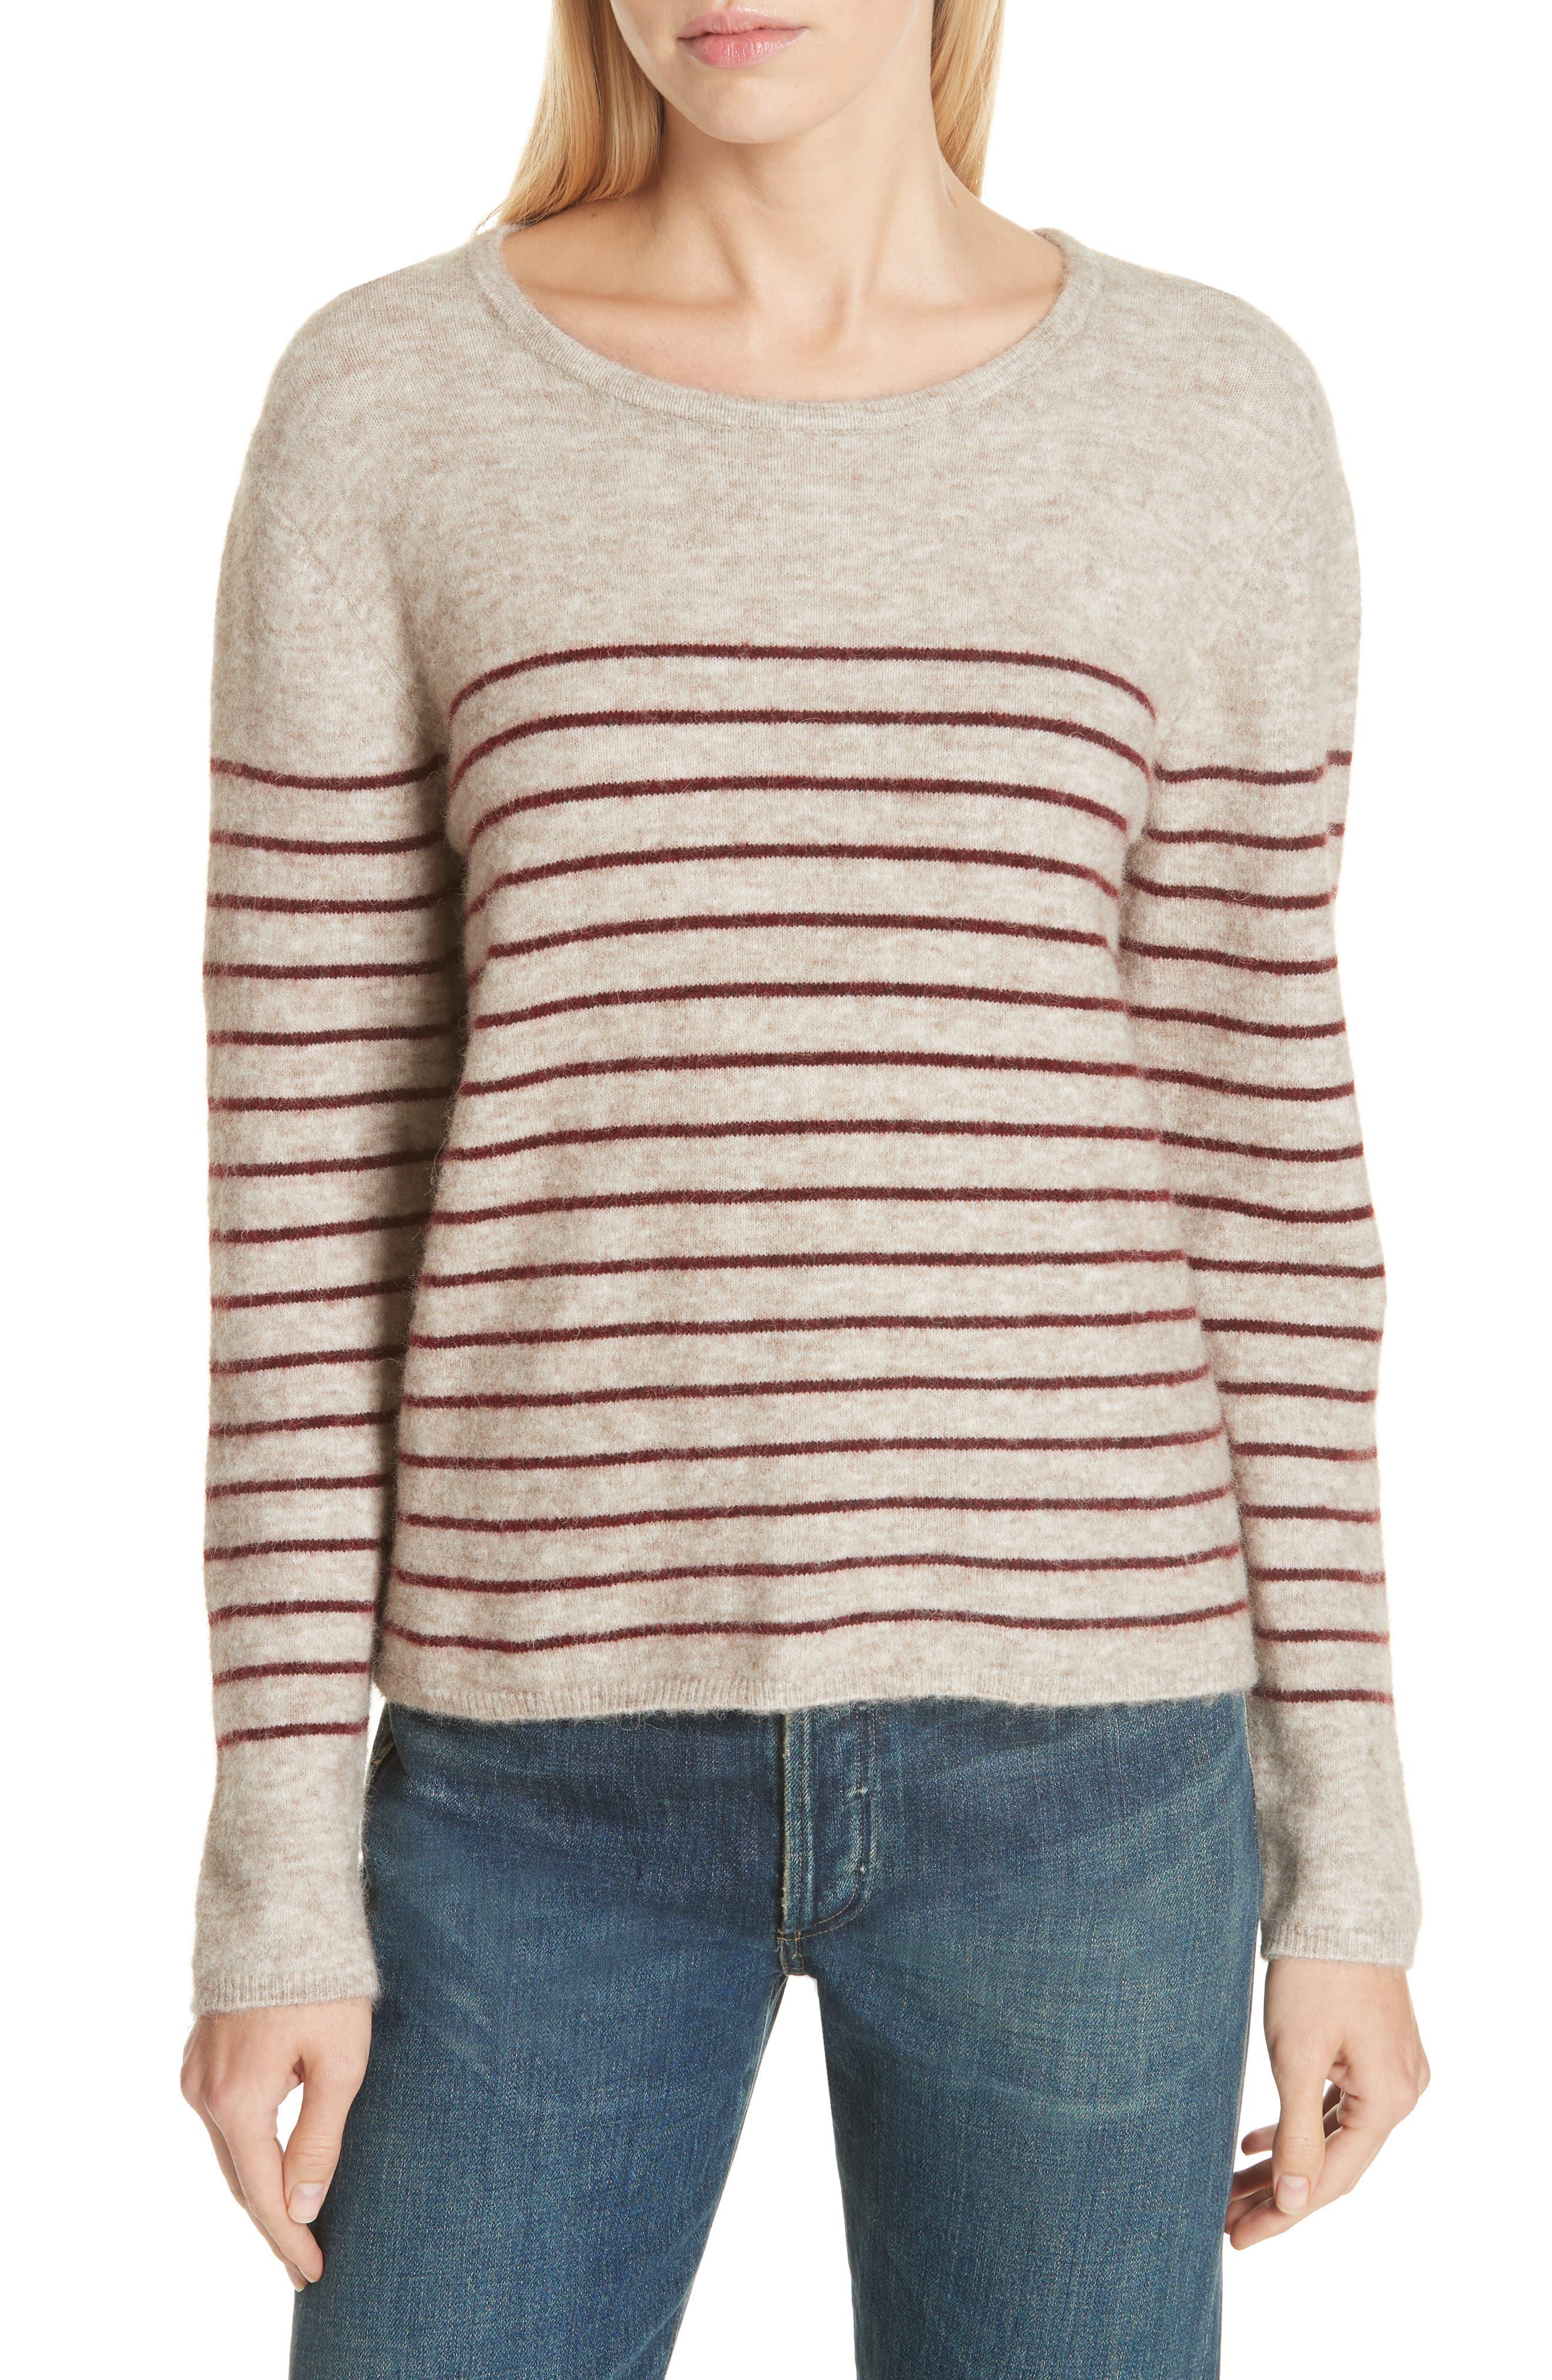 Artaud Stripe Sweater,                             Main thumbnail 1, color,                             BEIGE